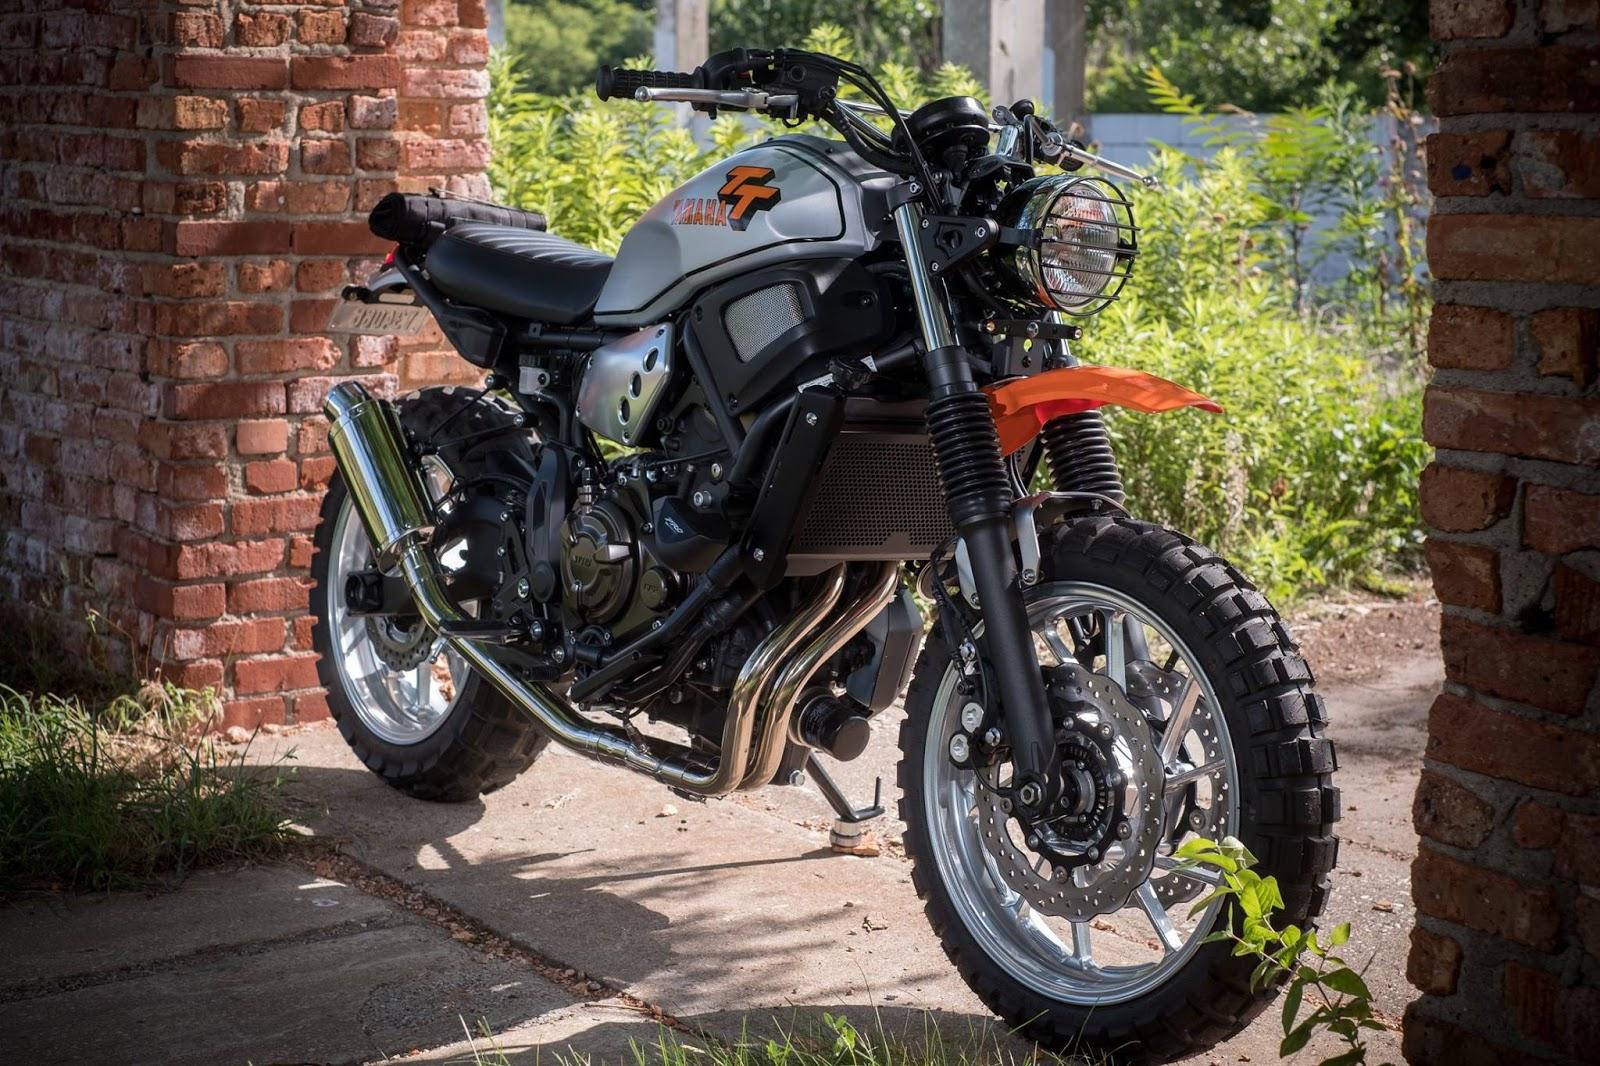 Racing Caf       Yamaha     TTXSR 700  by Hageman Motorcycles